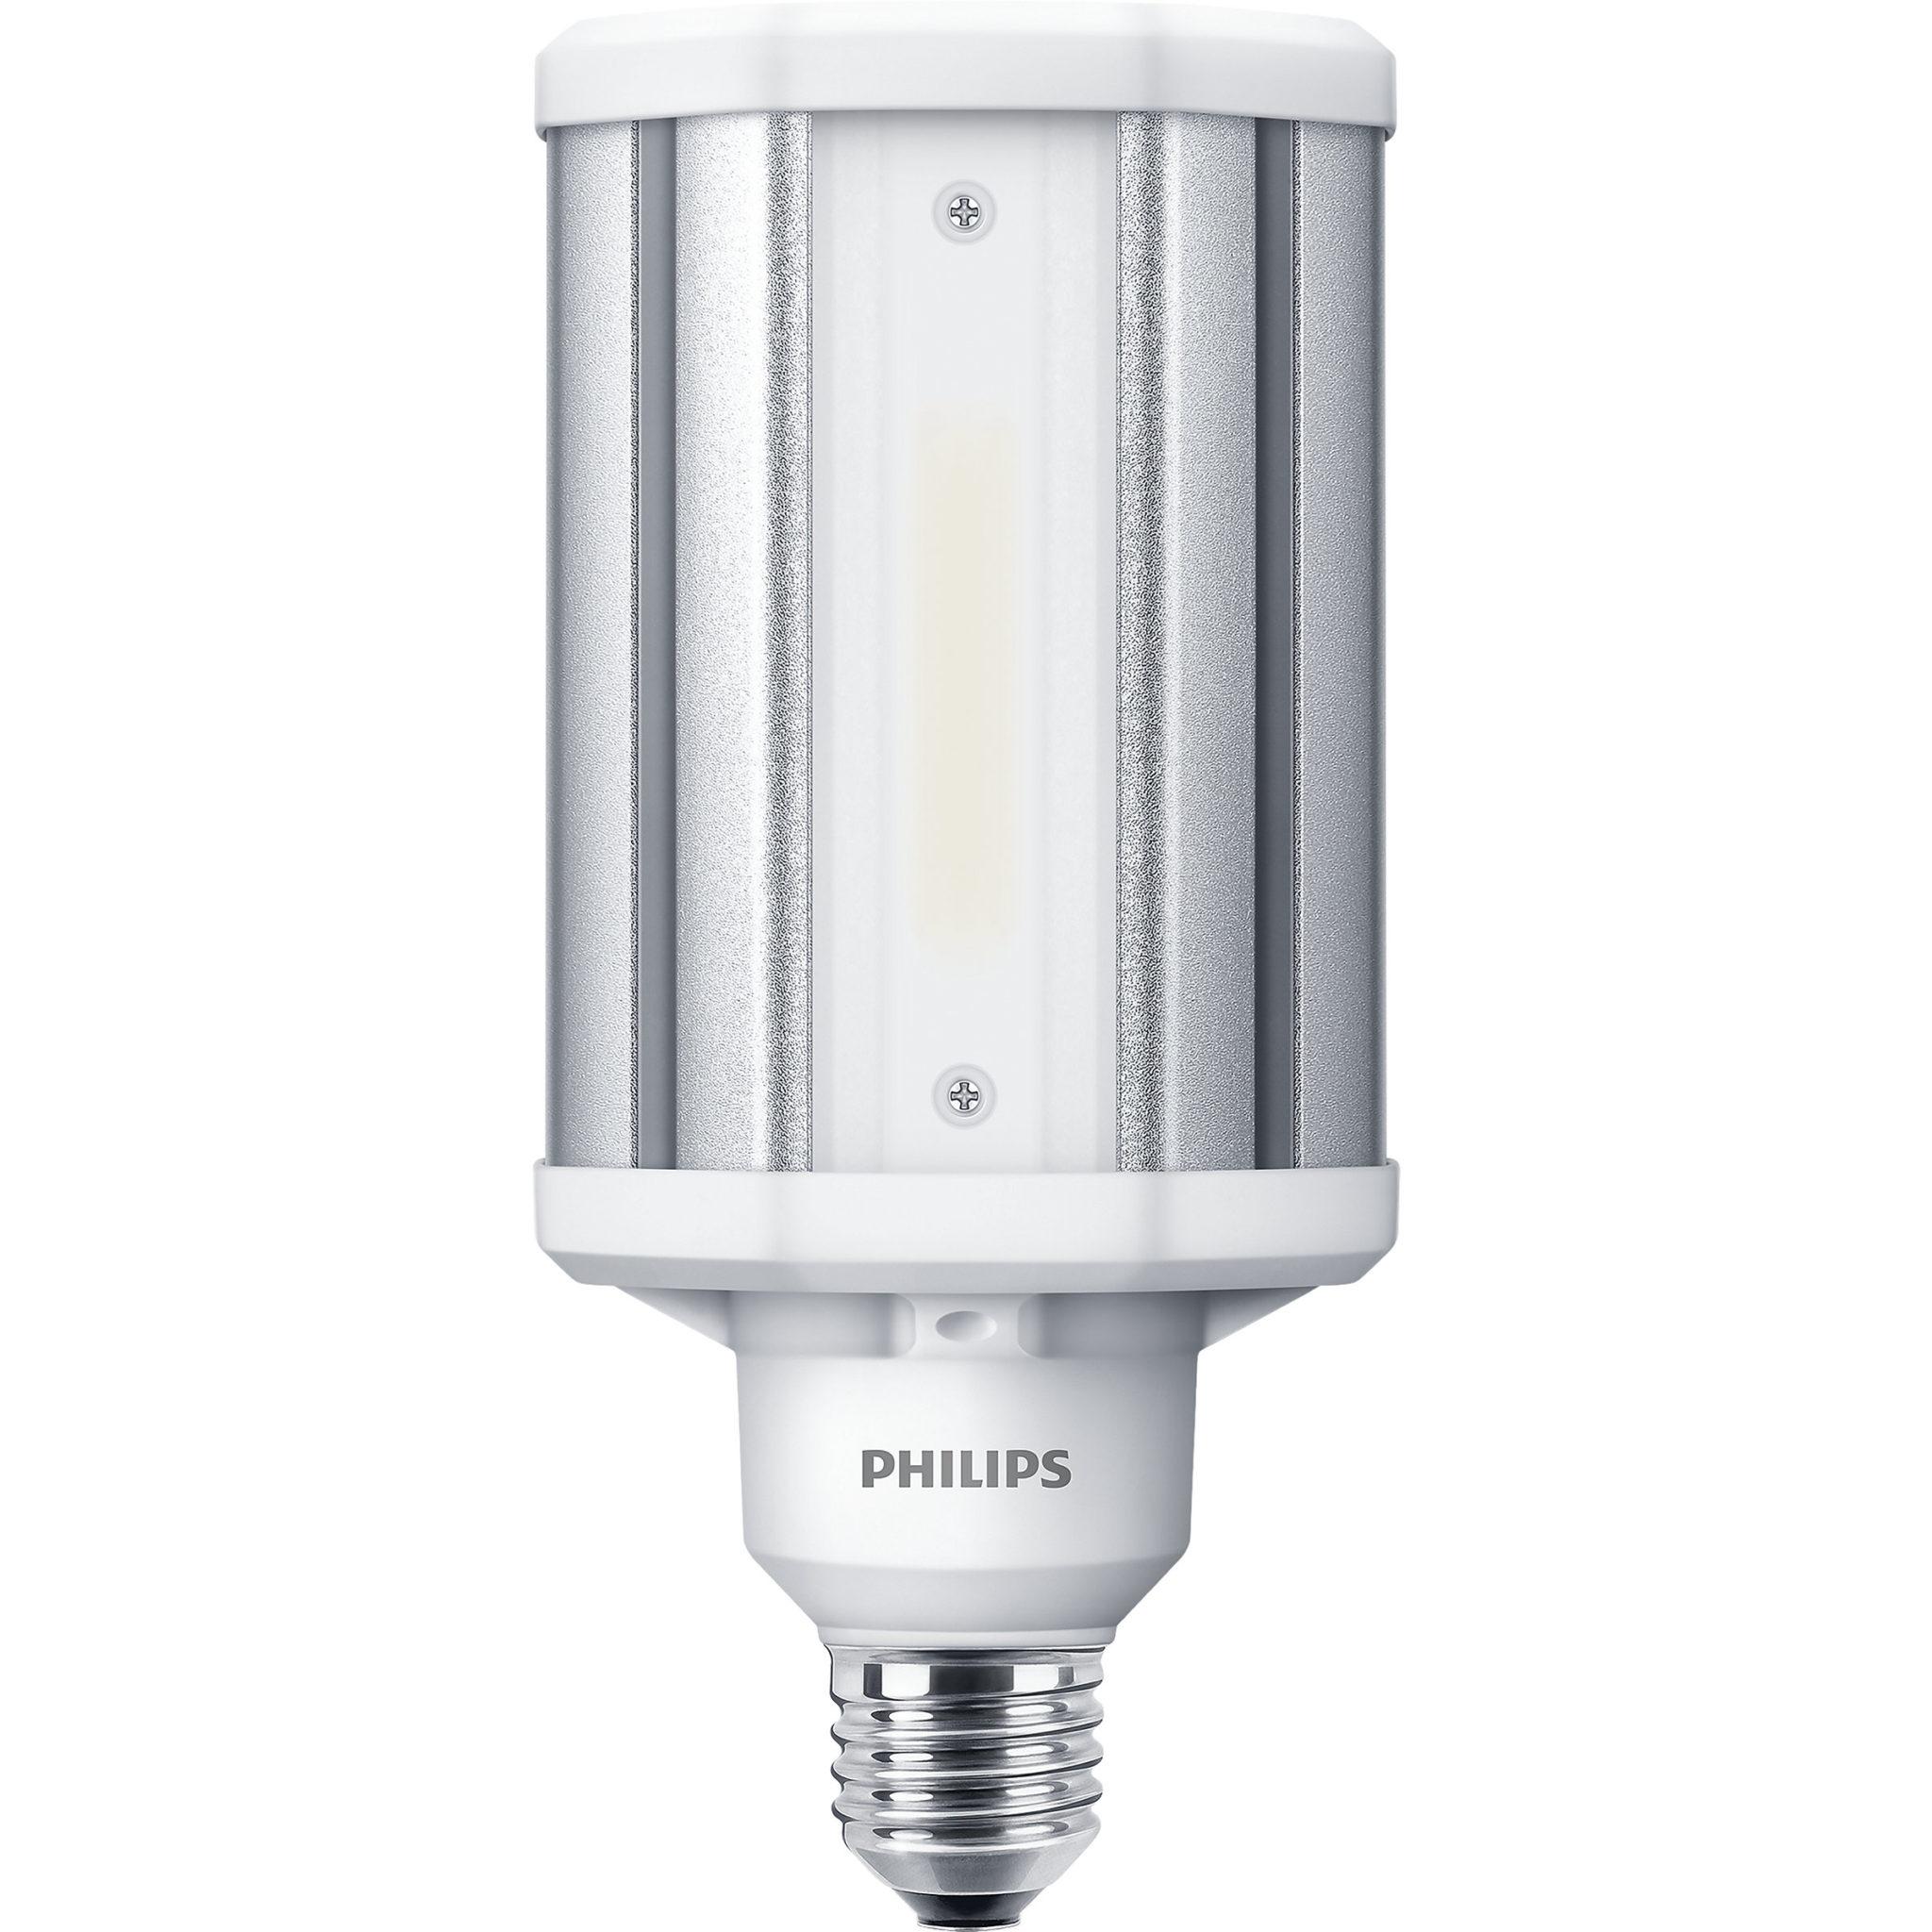 philips trueforce led corn lamp e27 33w 4000k frosted. Black Bedroom Furniture Sets. Home Design Ideas